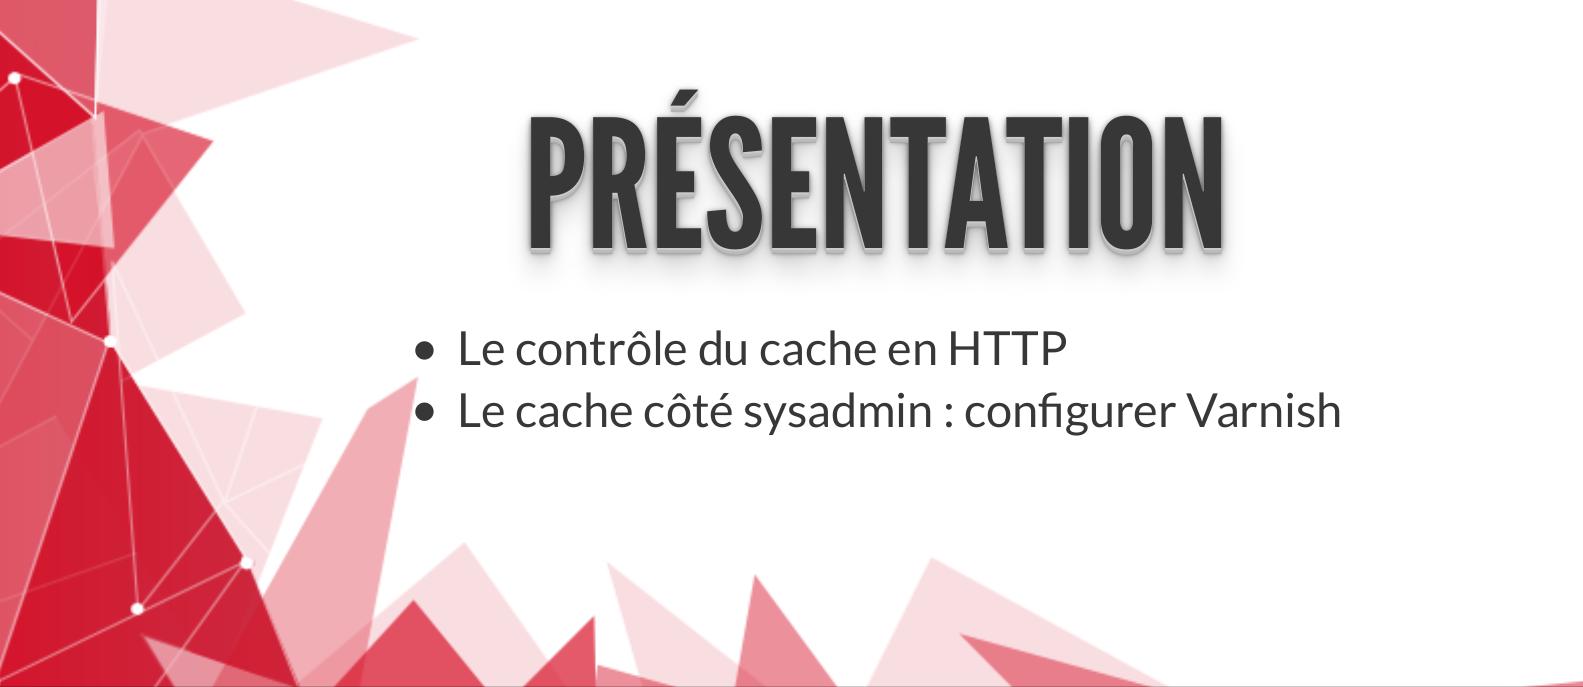 https://blog.evolix.ca/wp-content/uploads/2017/05/Presentation-de-systemes-de-cache.pdf